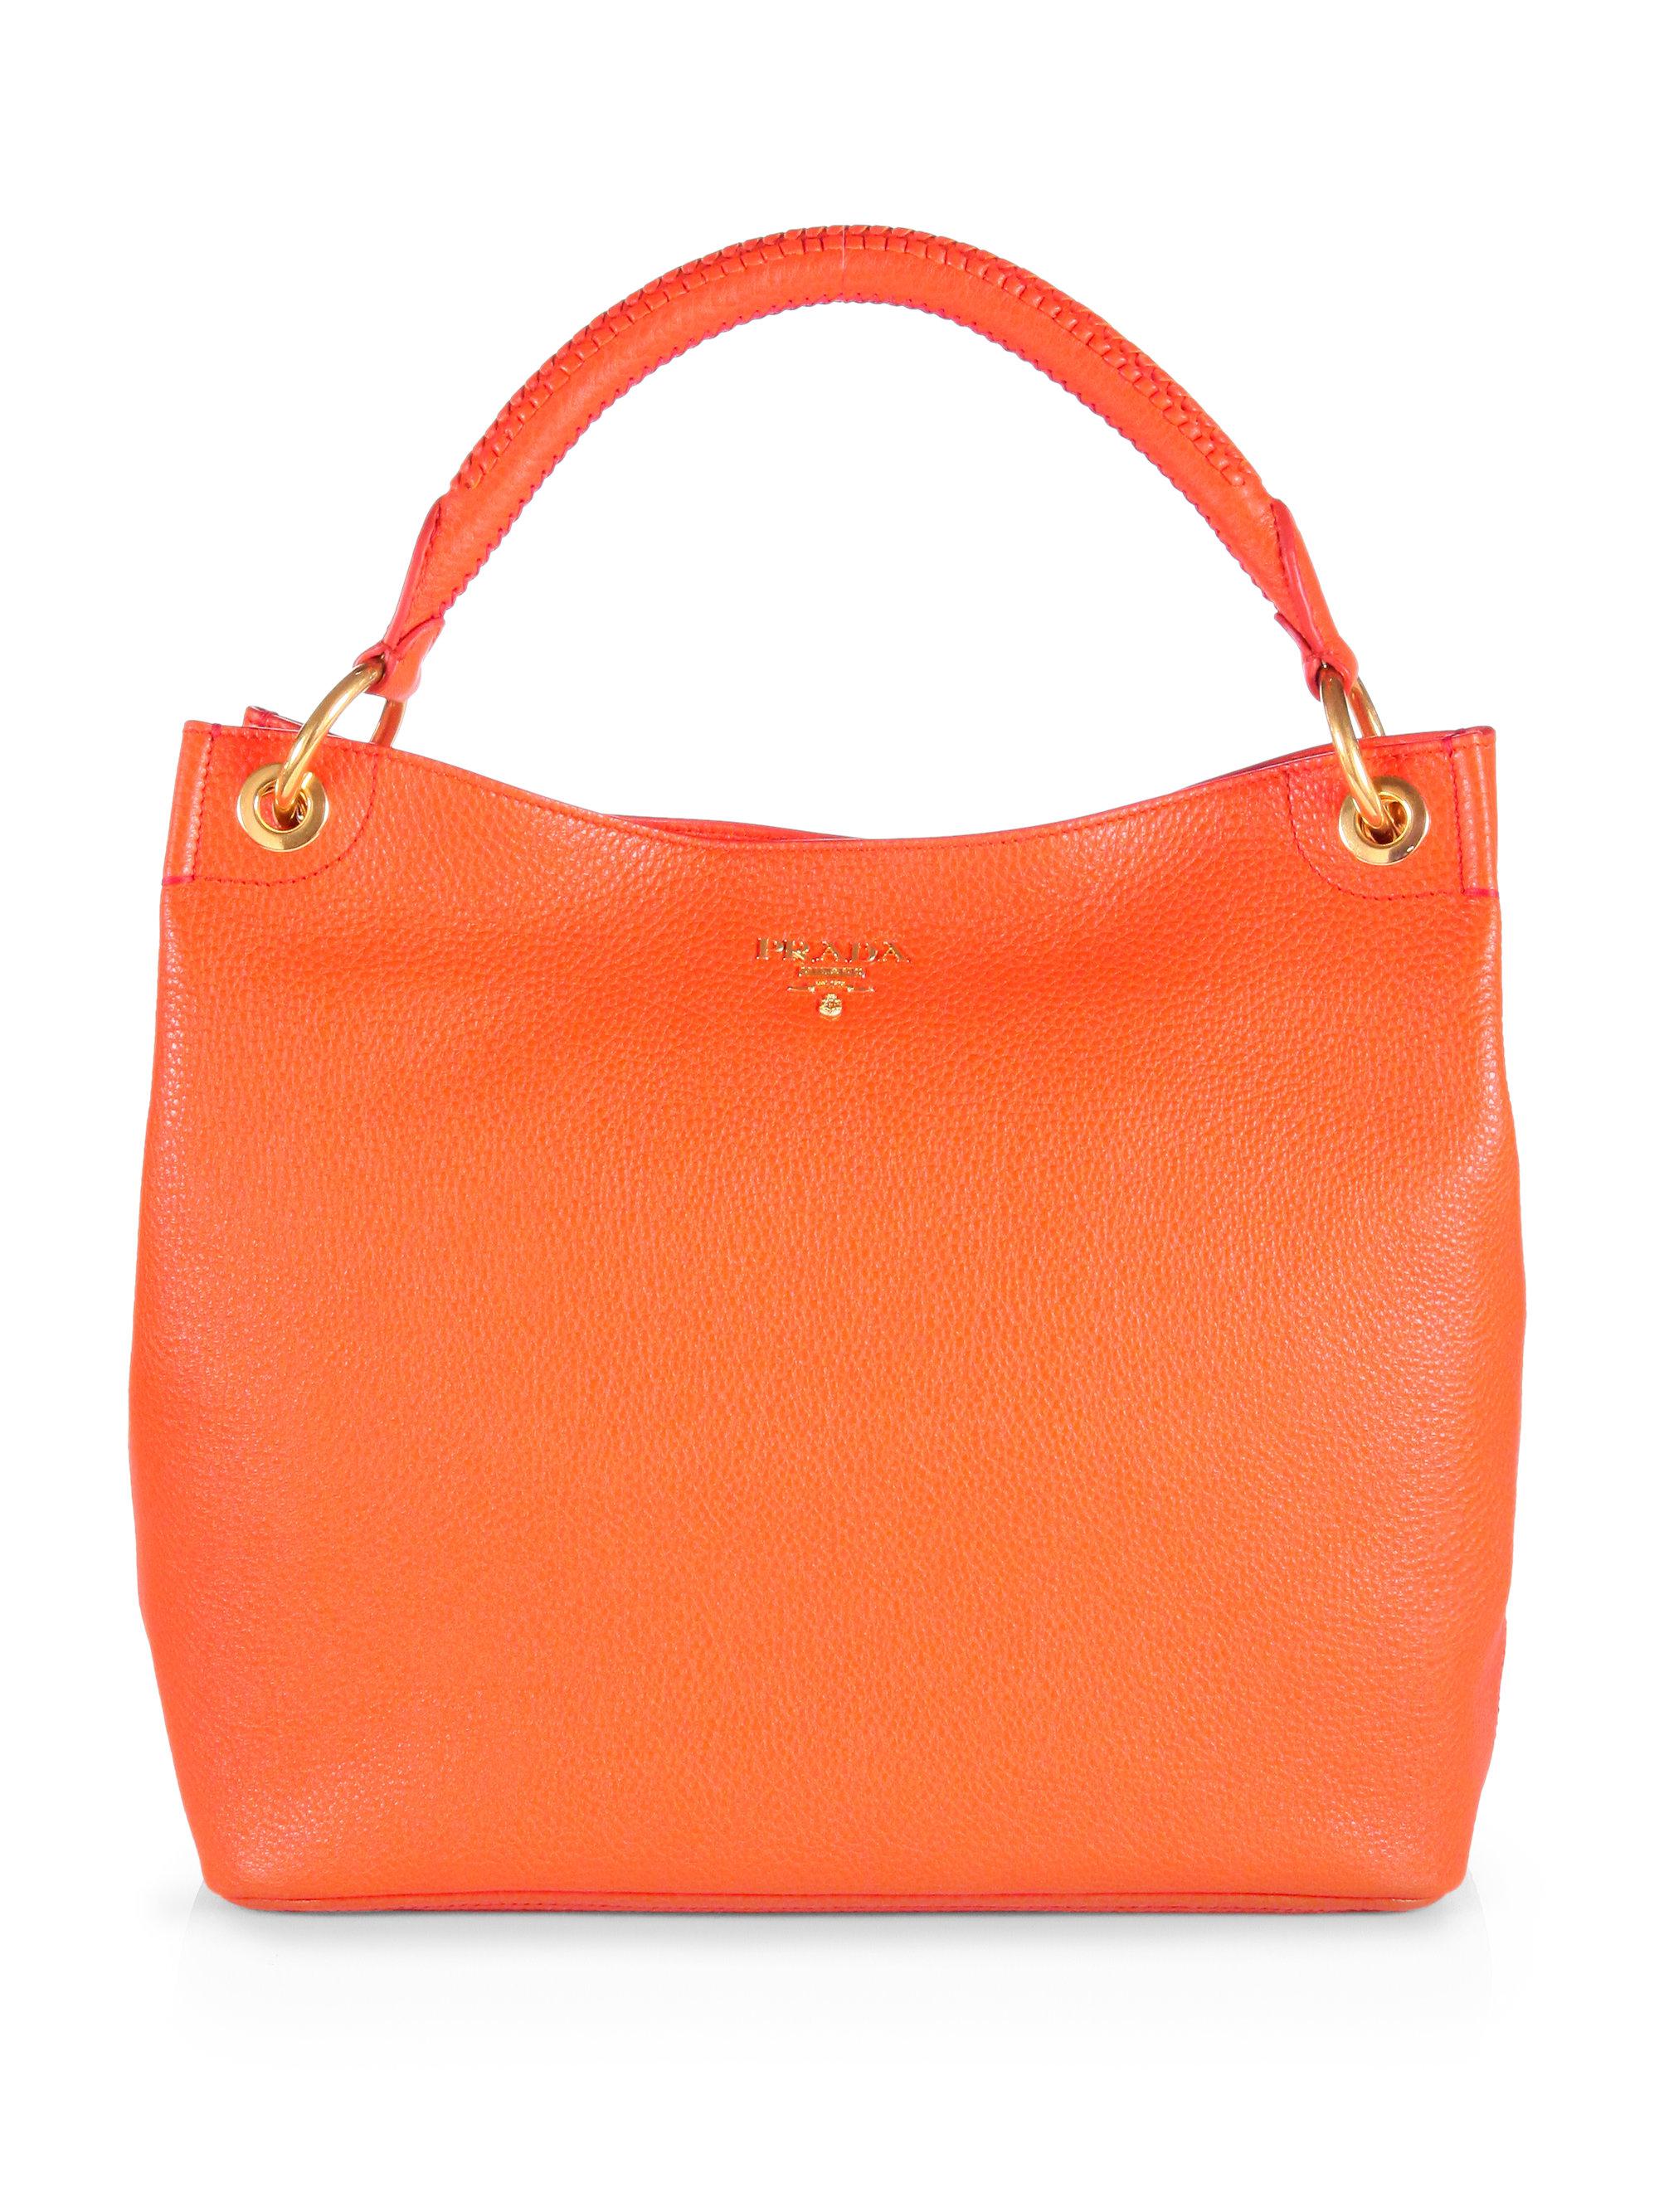 Prada Vitello Daino Hobo Bag in Orange | Lyst